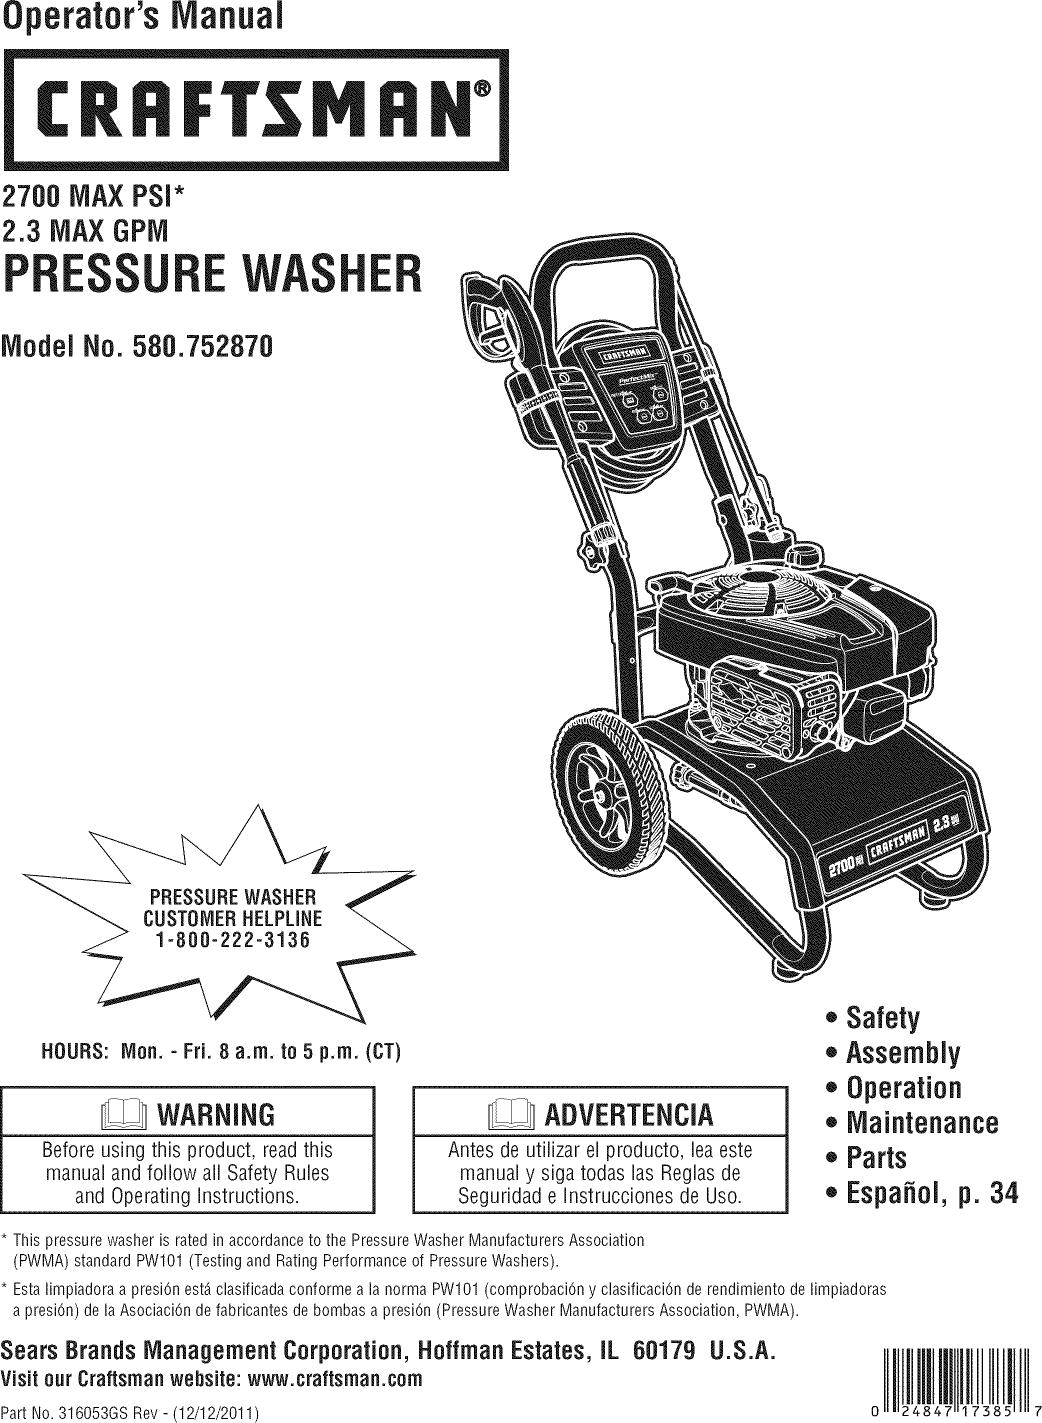 craftsman 580752870 1112463l user manual pressure washer manuals and